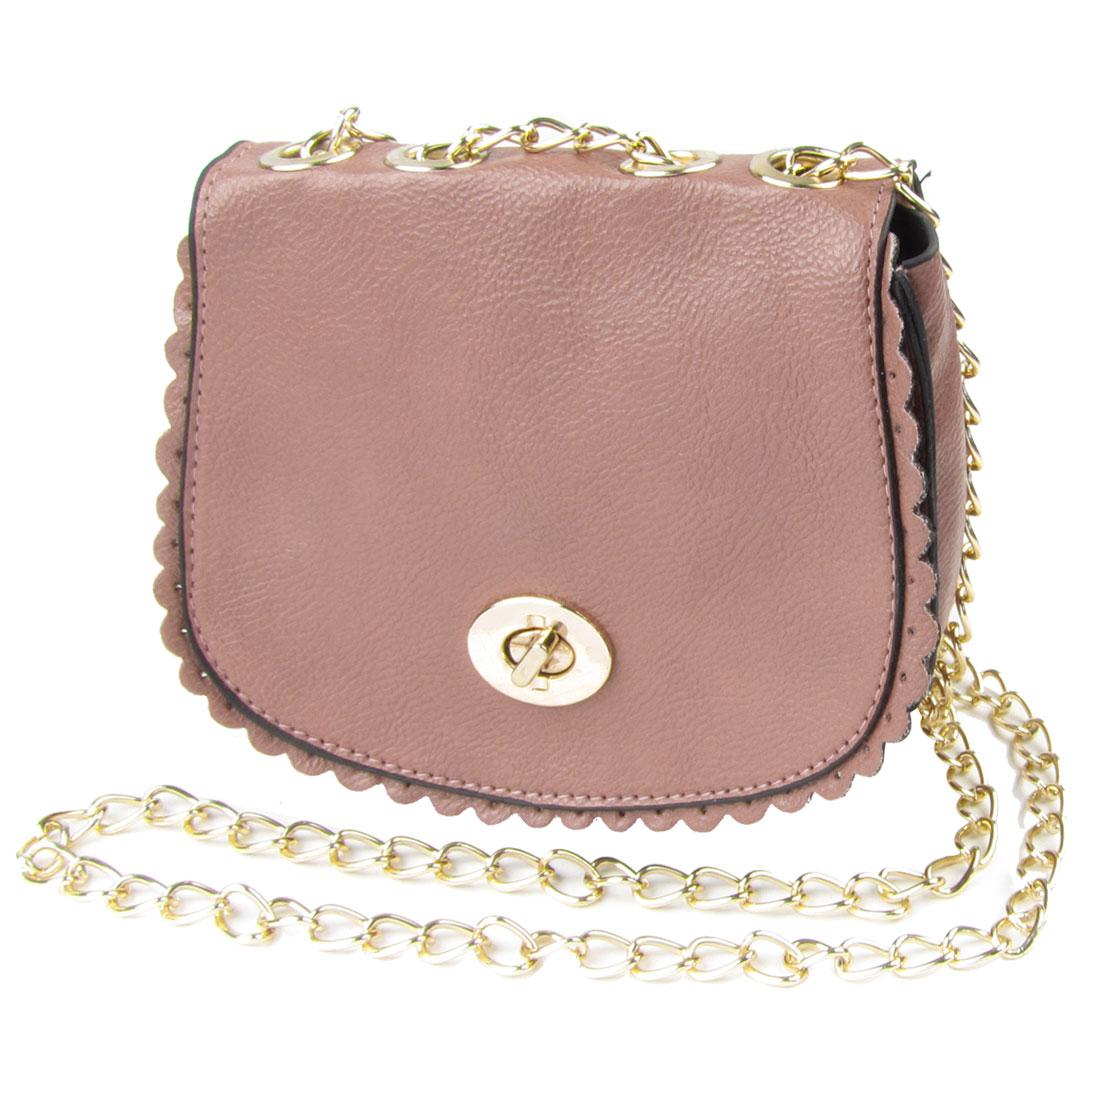 Pink Faux Leather Falbala Design Gold Tone Metal Chain Messenger Shoulder Bag